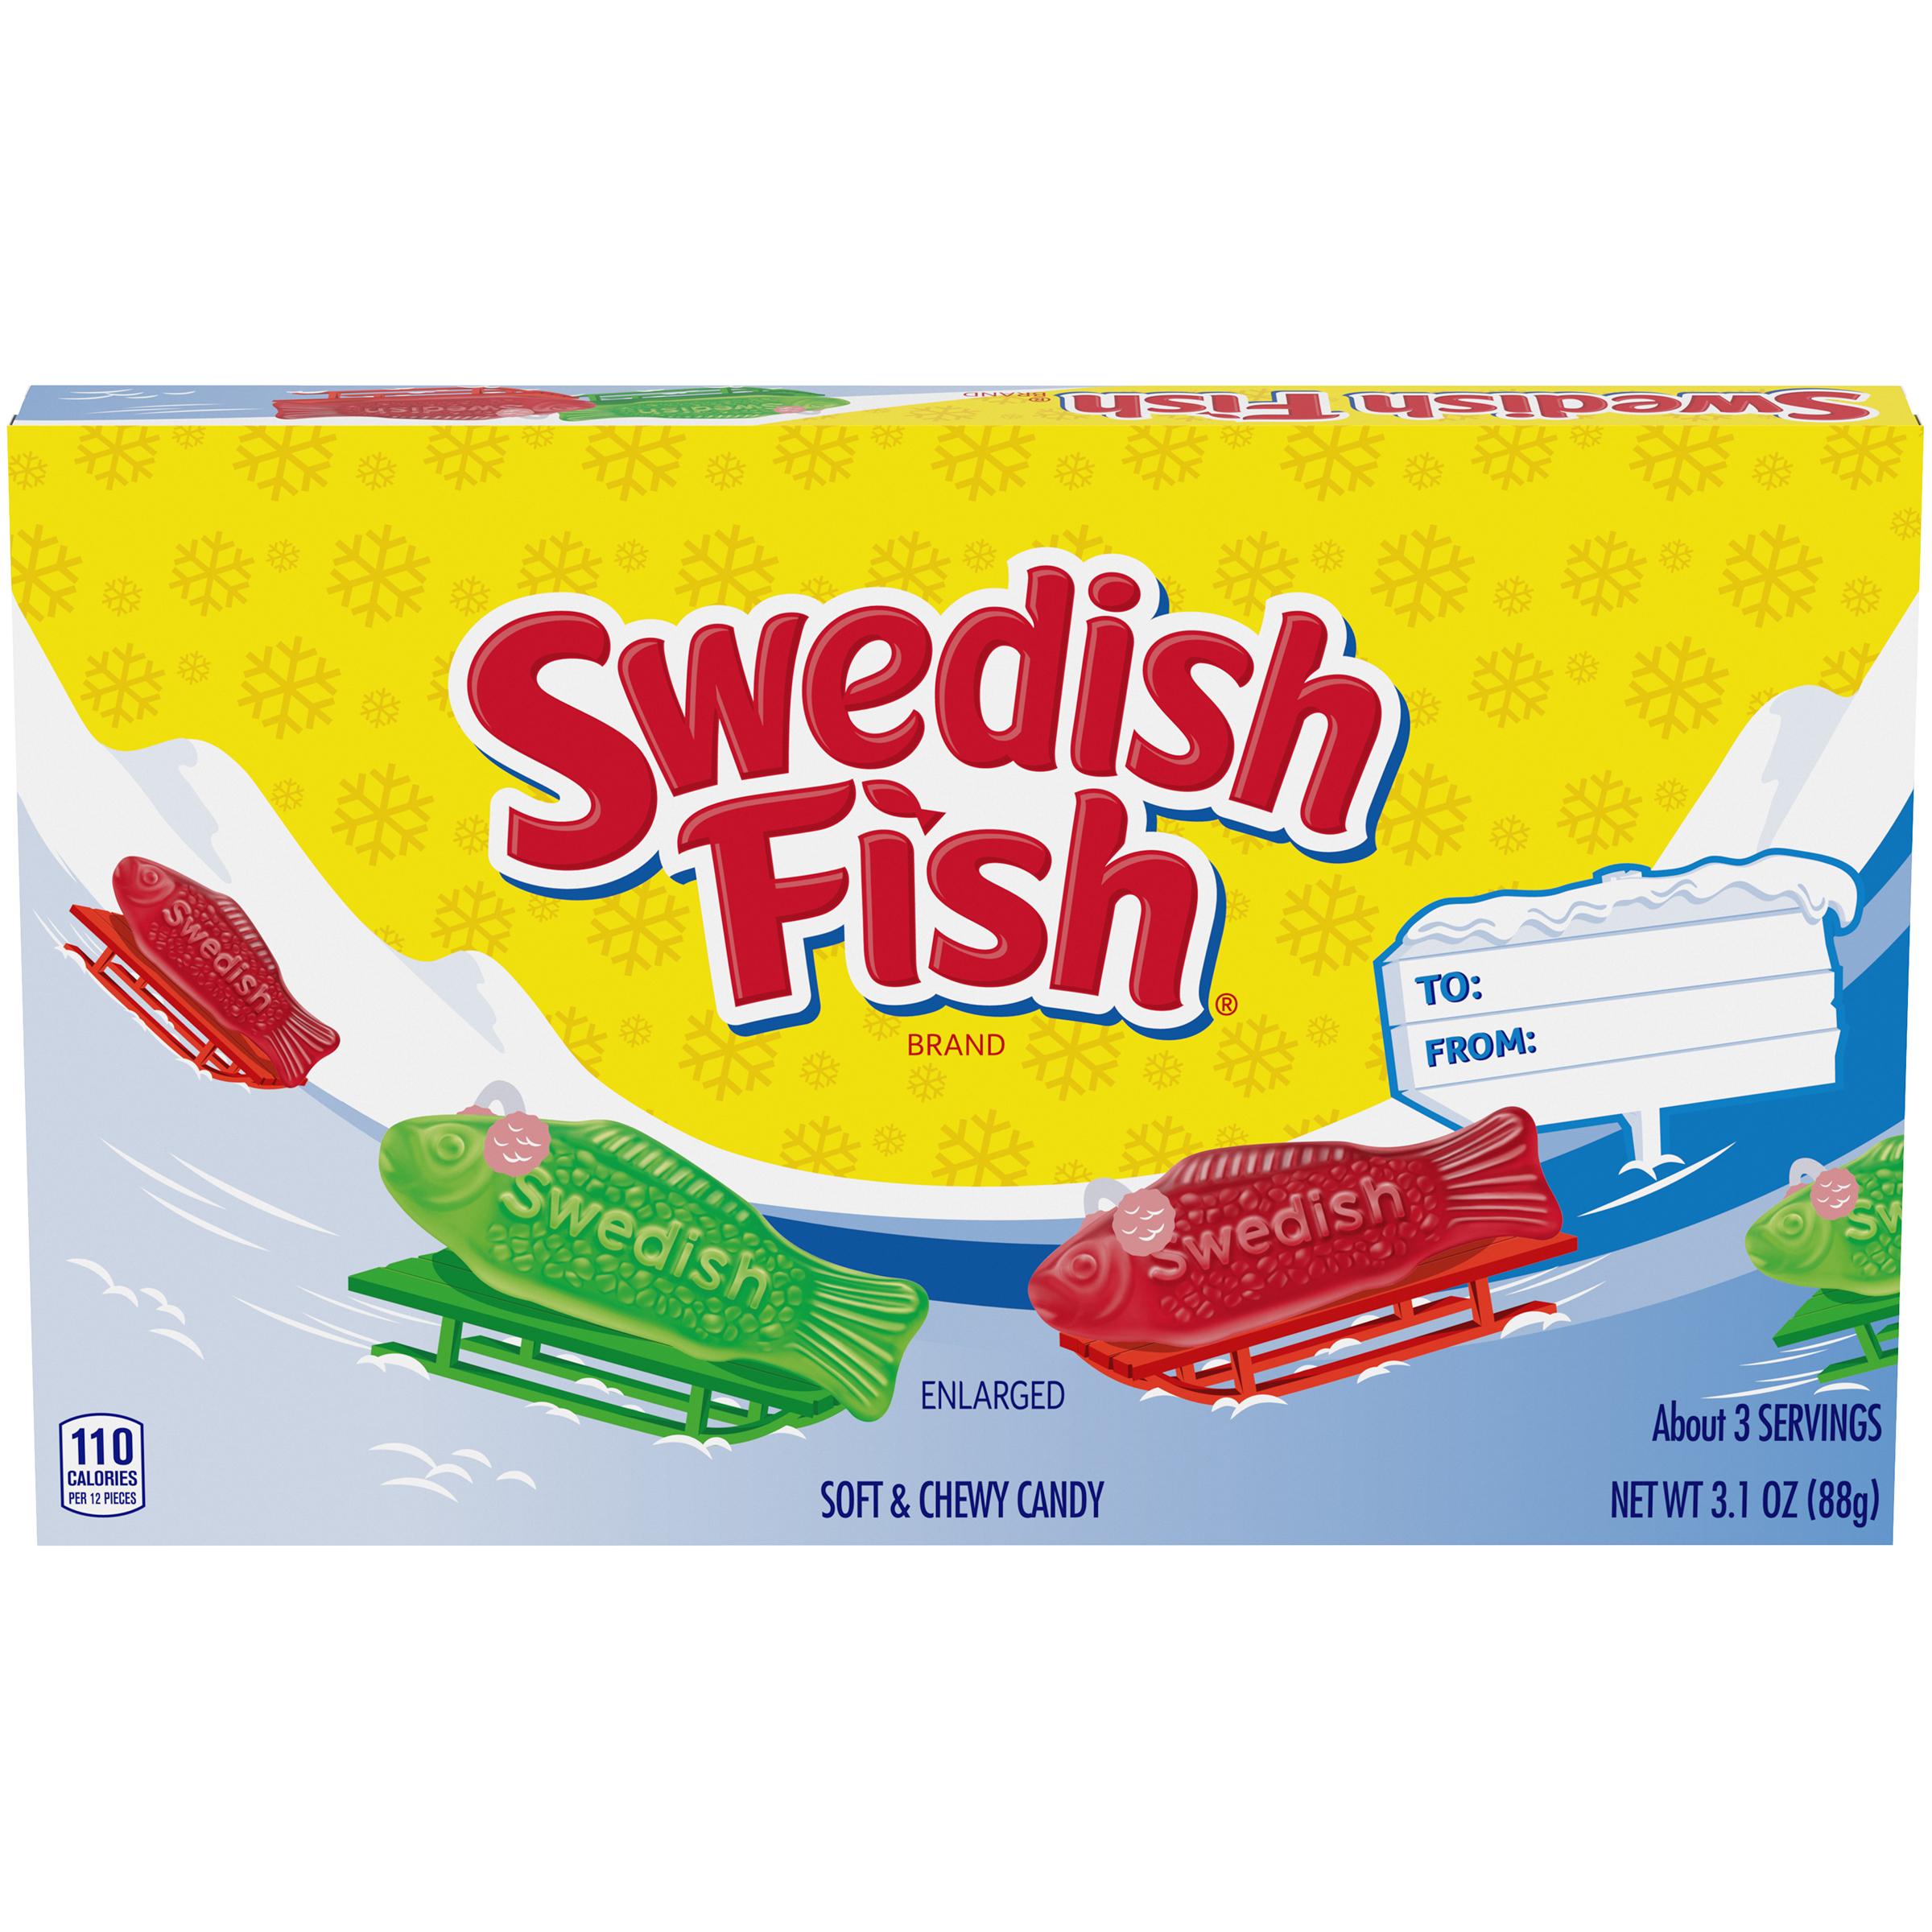 SWEDISH FISH Aqualife Soft Candy 3.11 oz